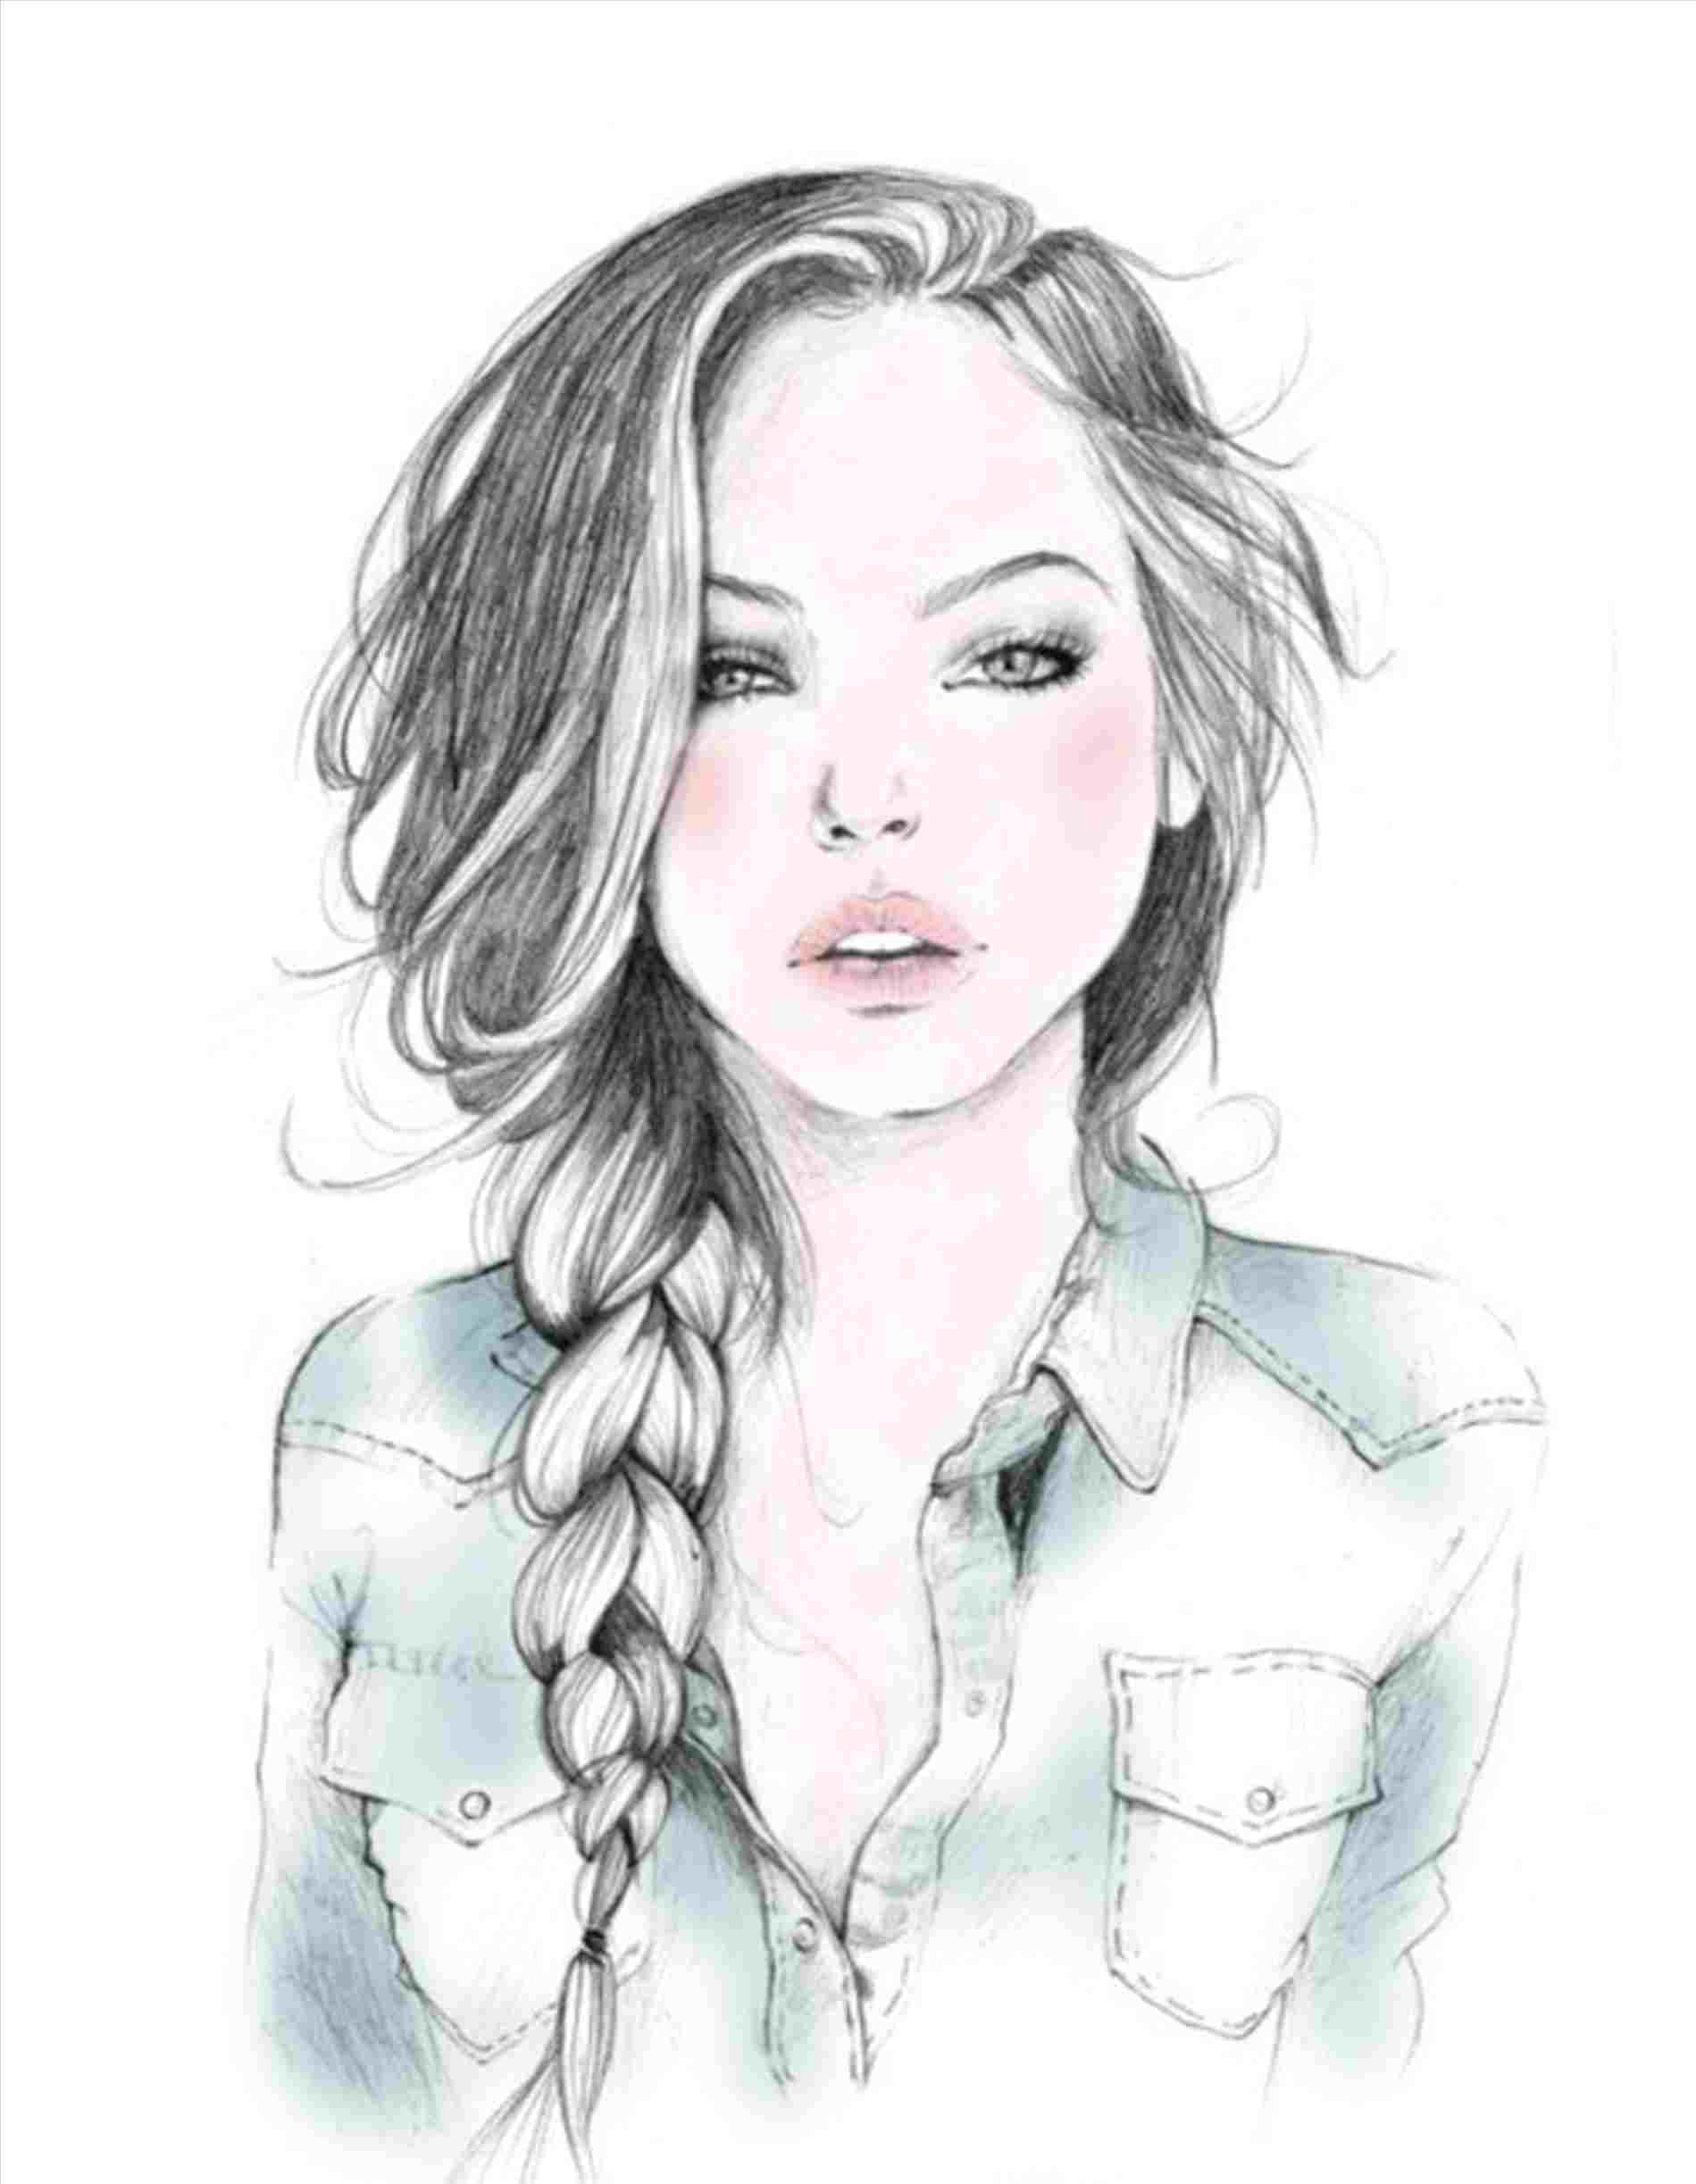 images cute drawings of girls realistic pretty girl imaganationfaceorgrhimaganationfaceorg pin od zuzia na w pinterest art i artworkrhpinterestcom pin cute drawings of girls realistic od jpg